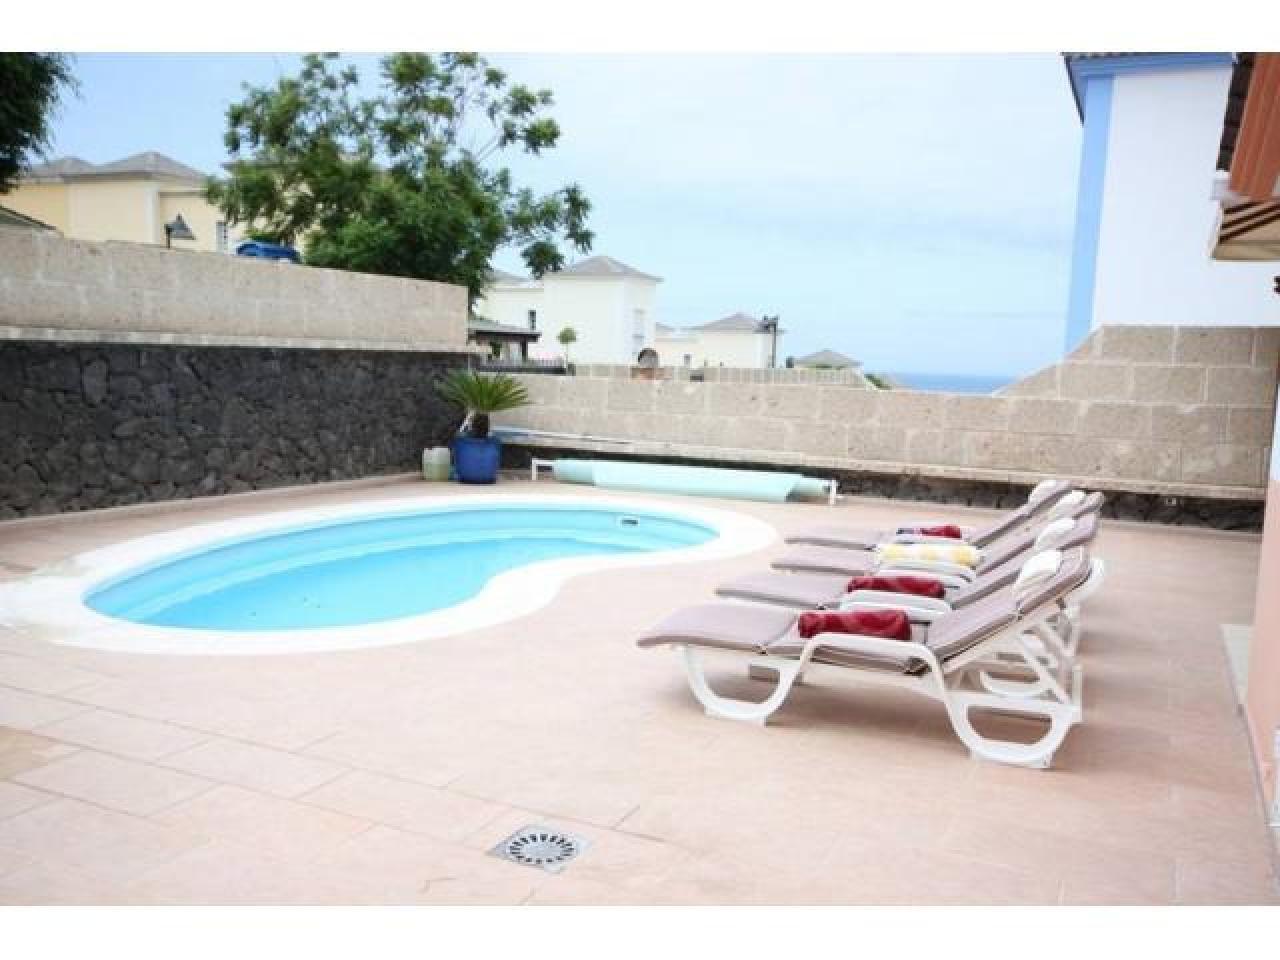 Villa in Tenerife for rent, in Costa Adeje, Madronal de Fanabe - 9